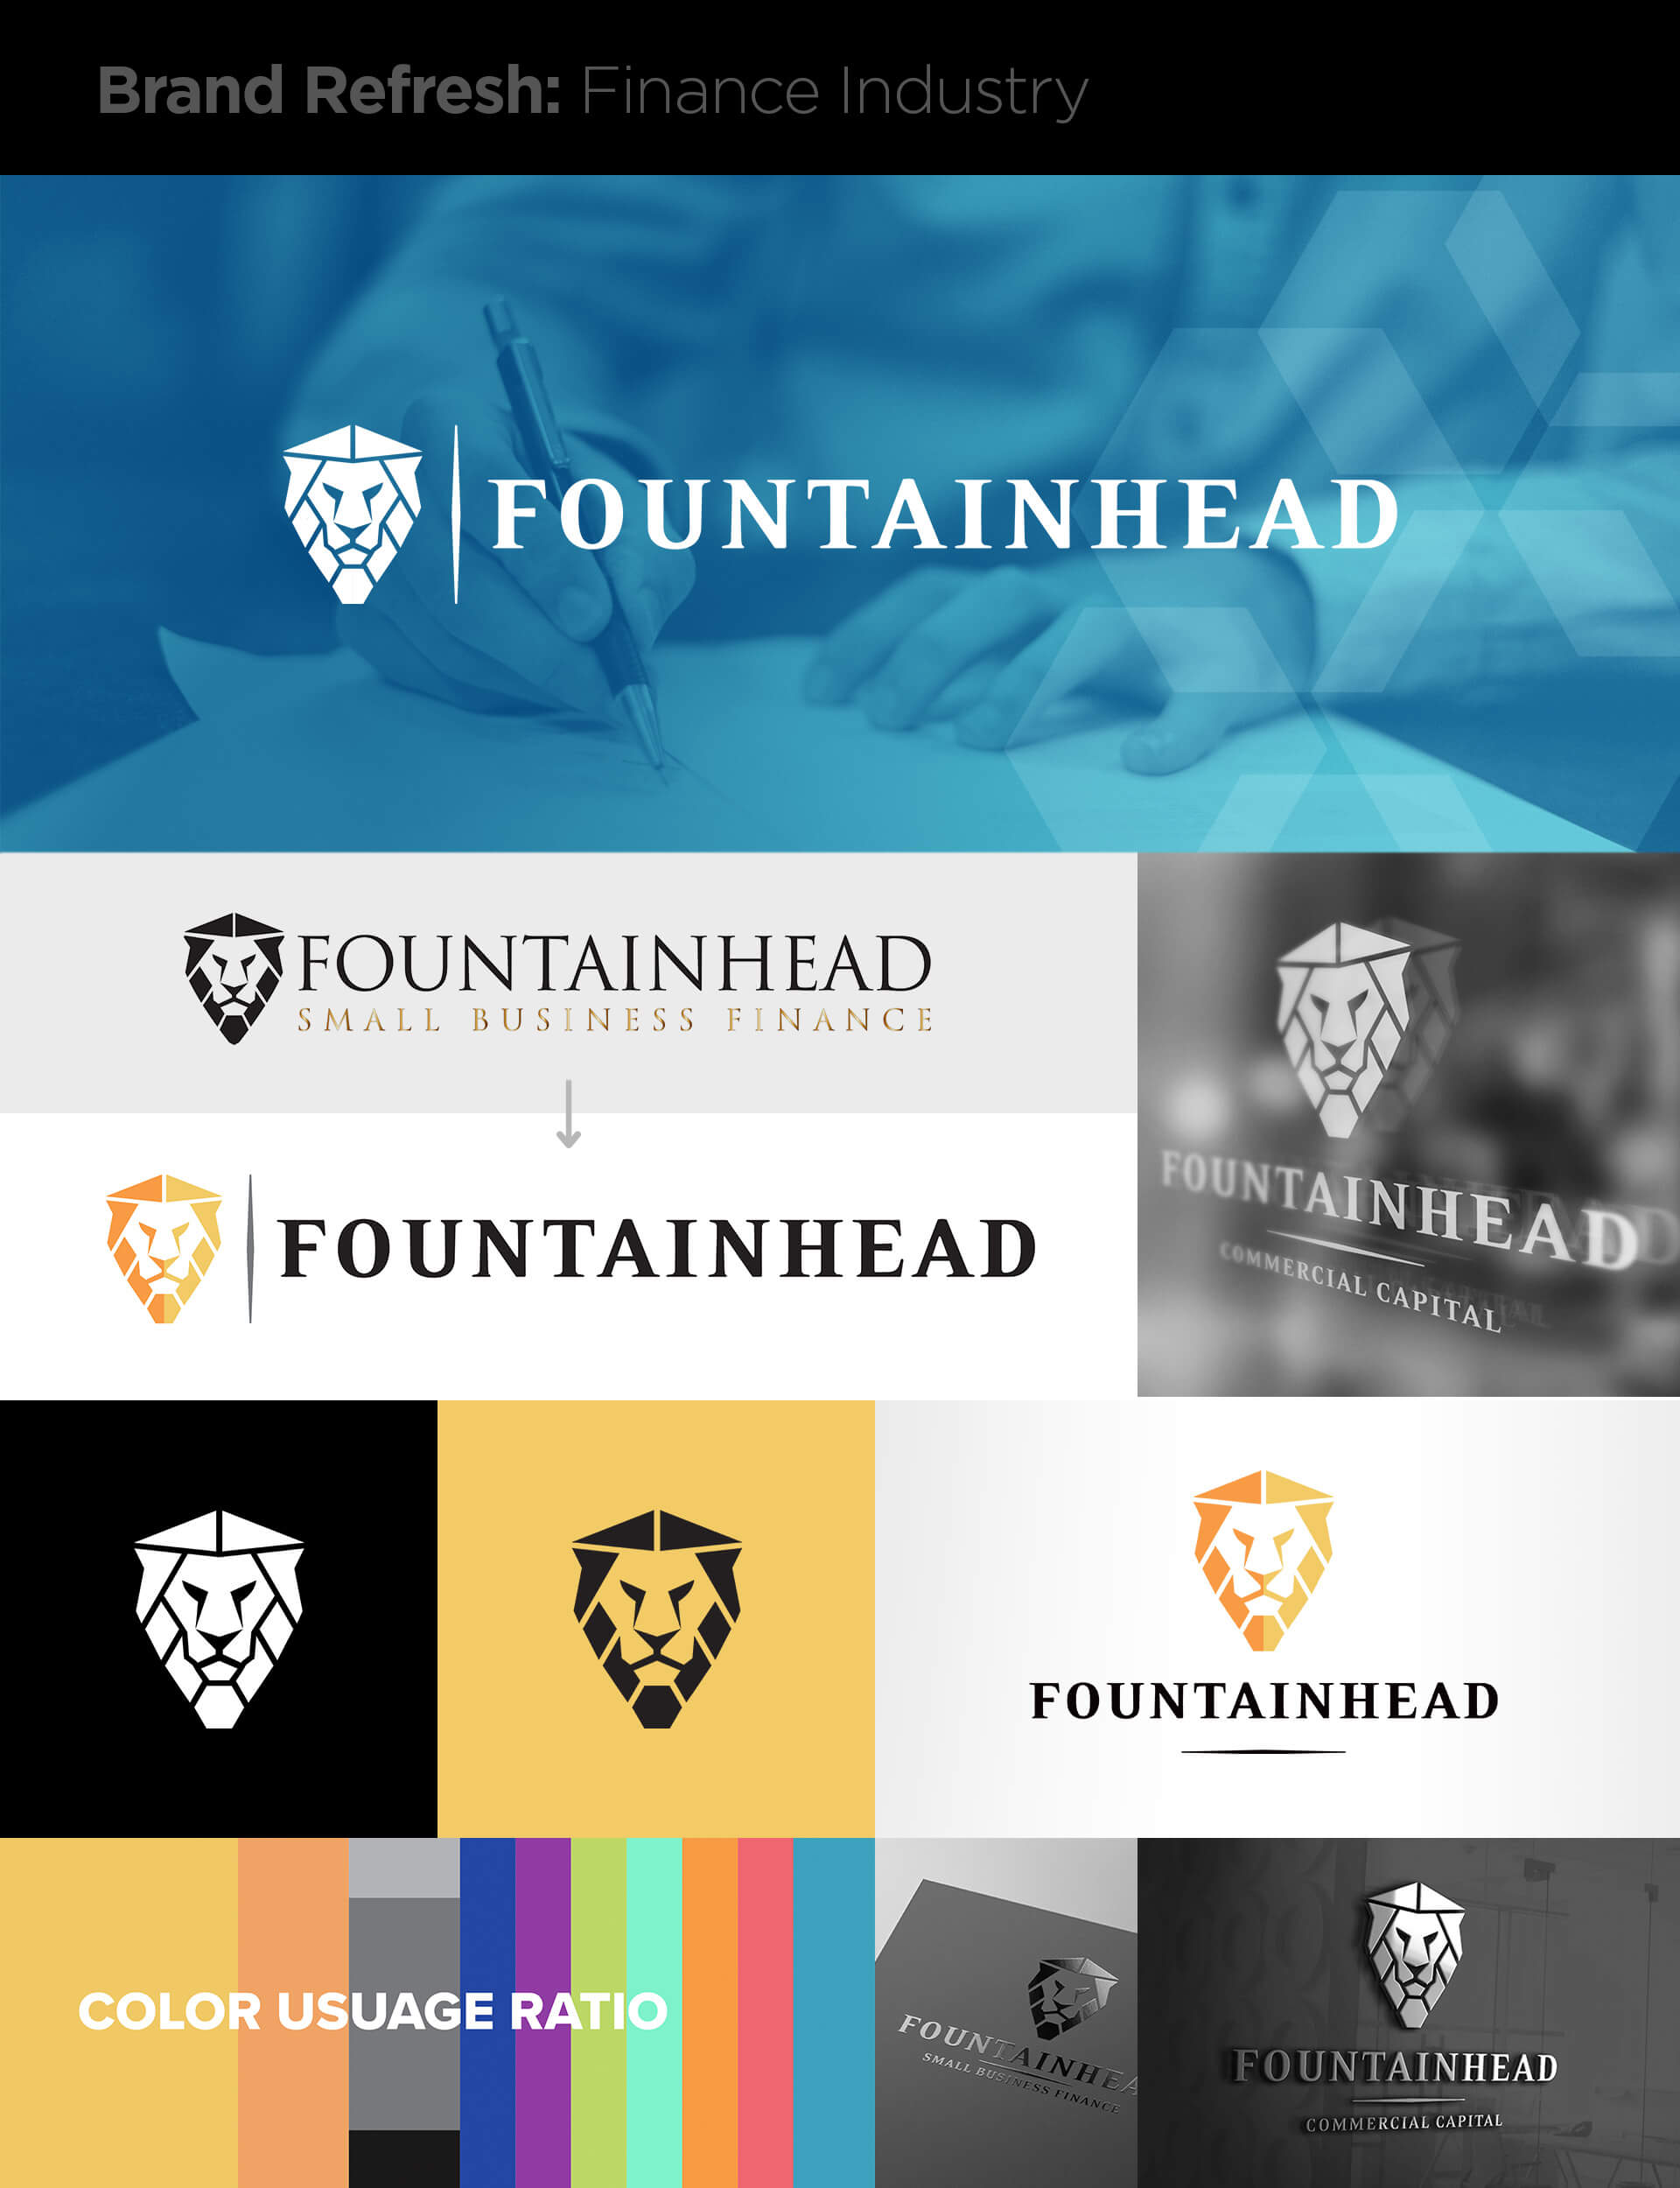 logo-design-refresh-fountainhead-sample